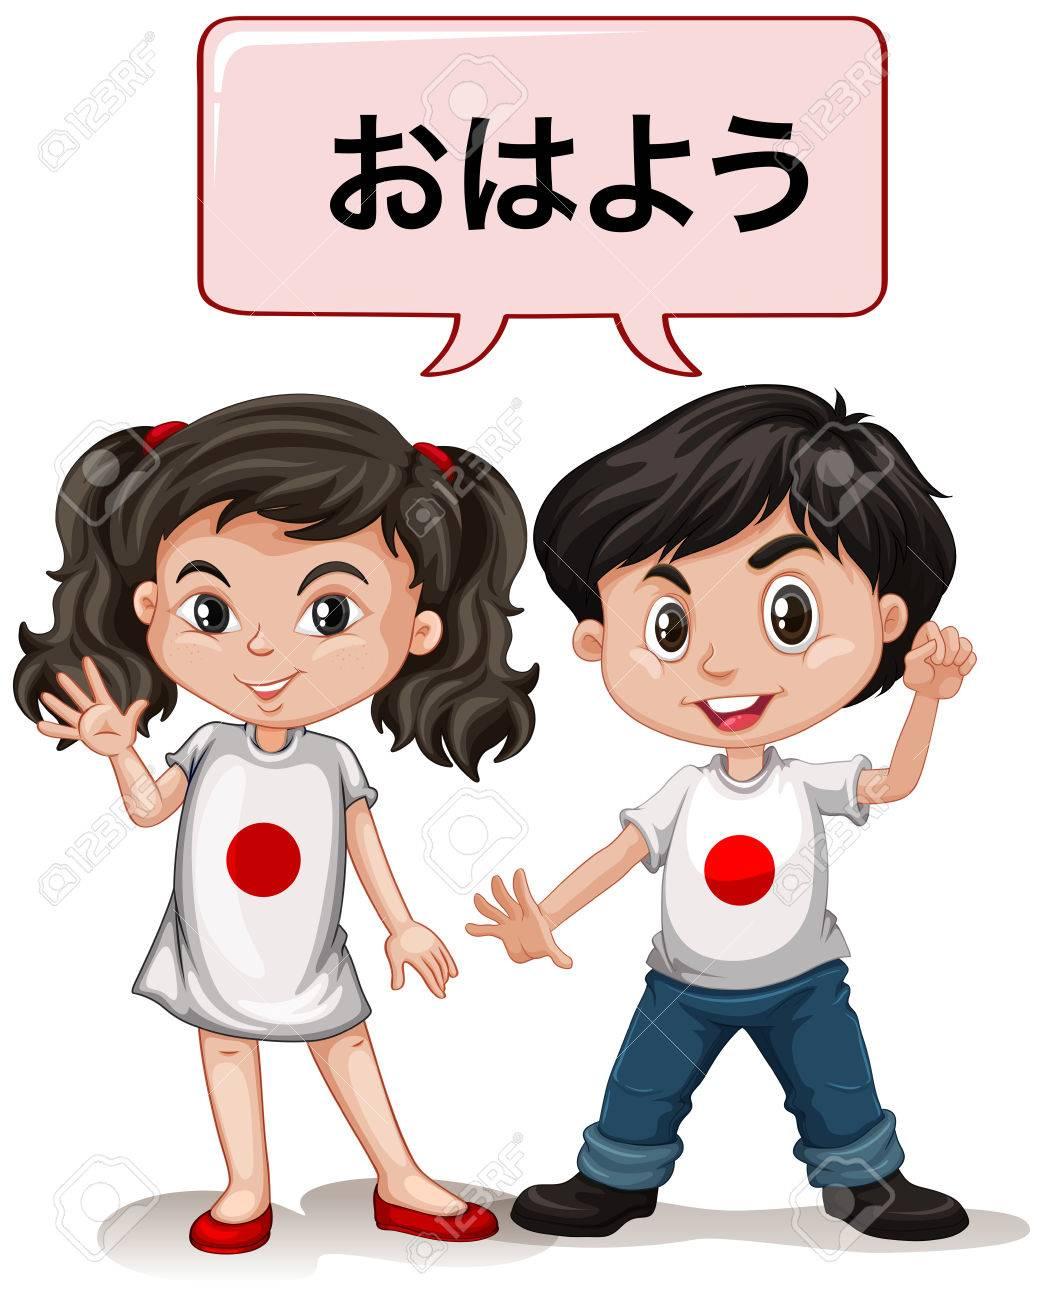 Japanese boy and girl saying hello illustration.